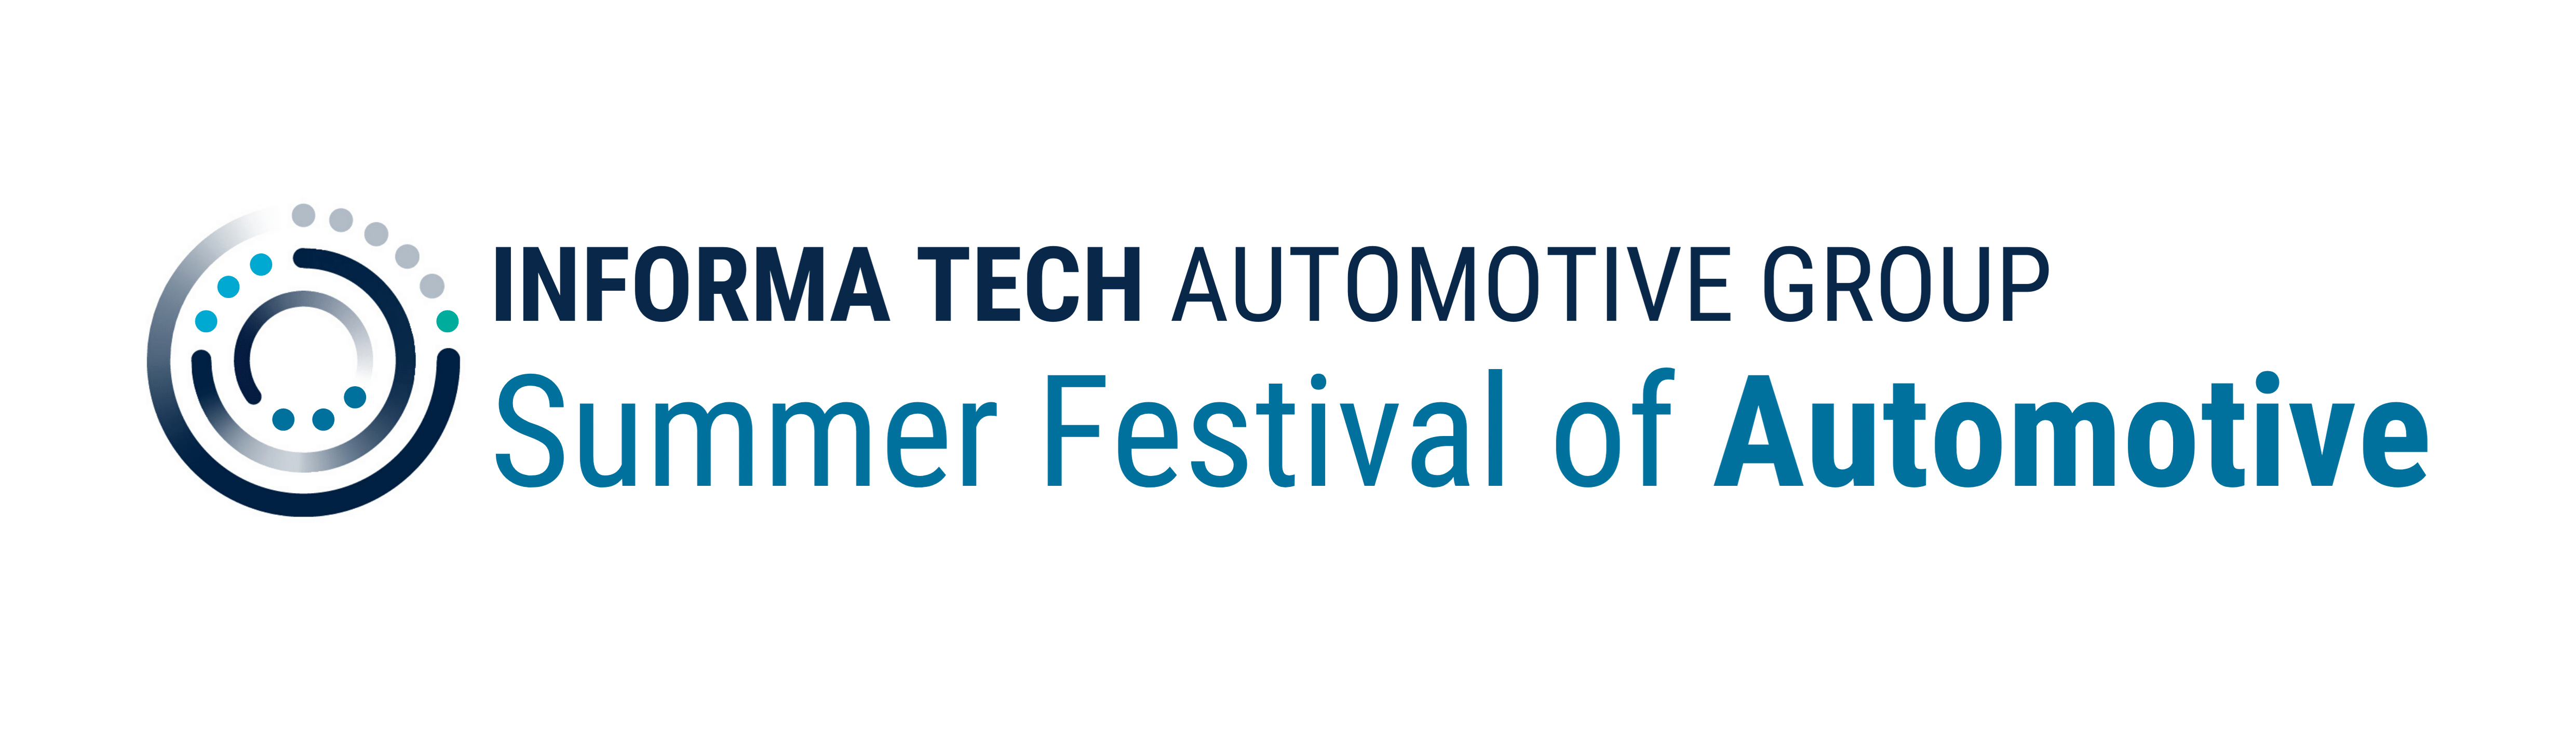 Informa Tech Automotive Group, Summer Festival of Automotive